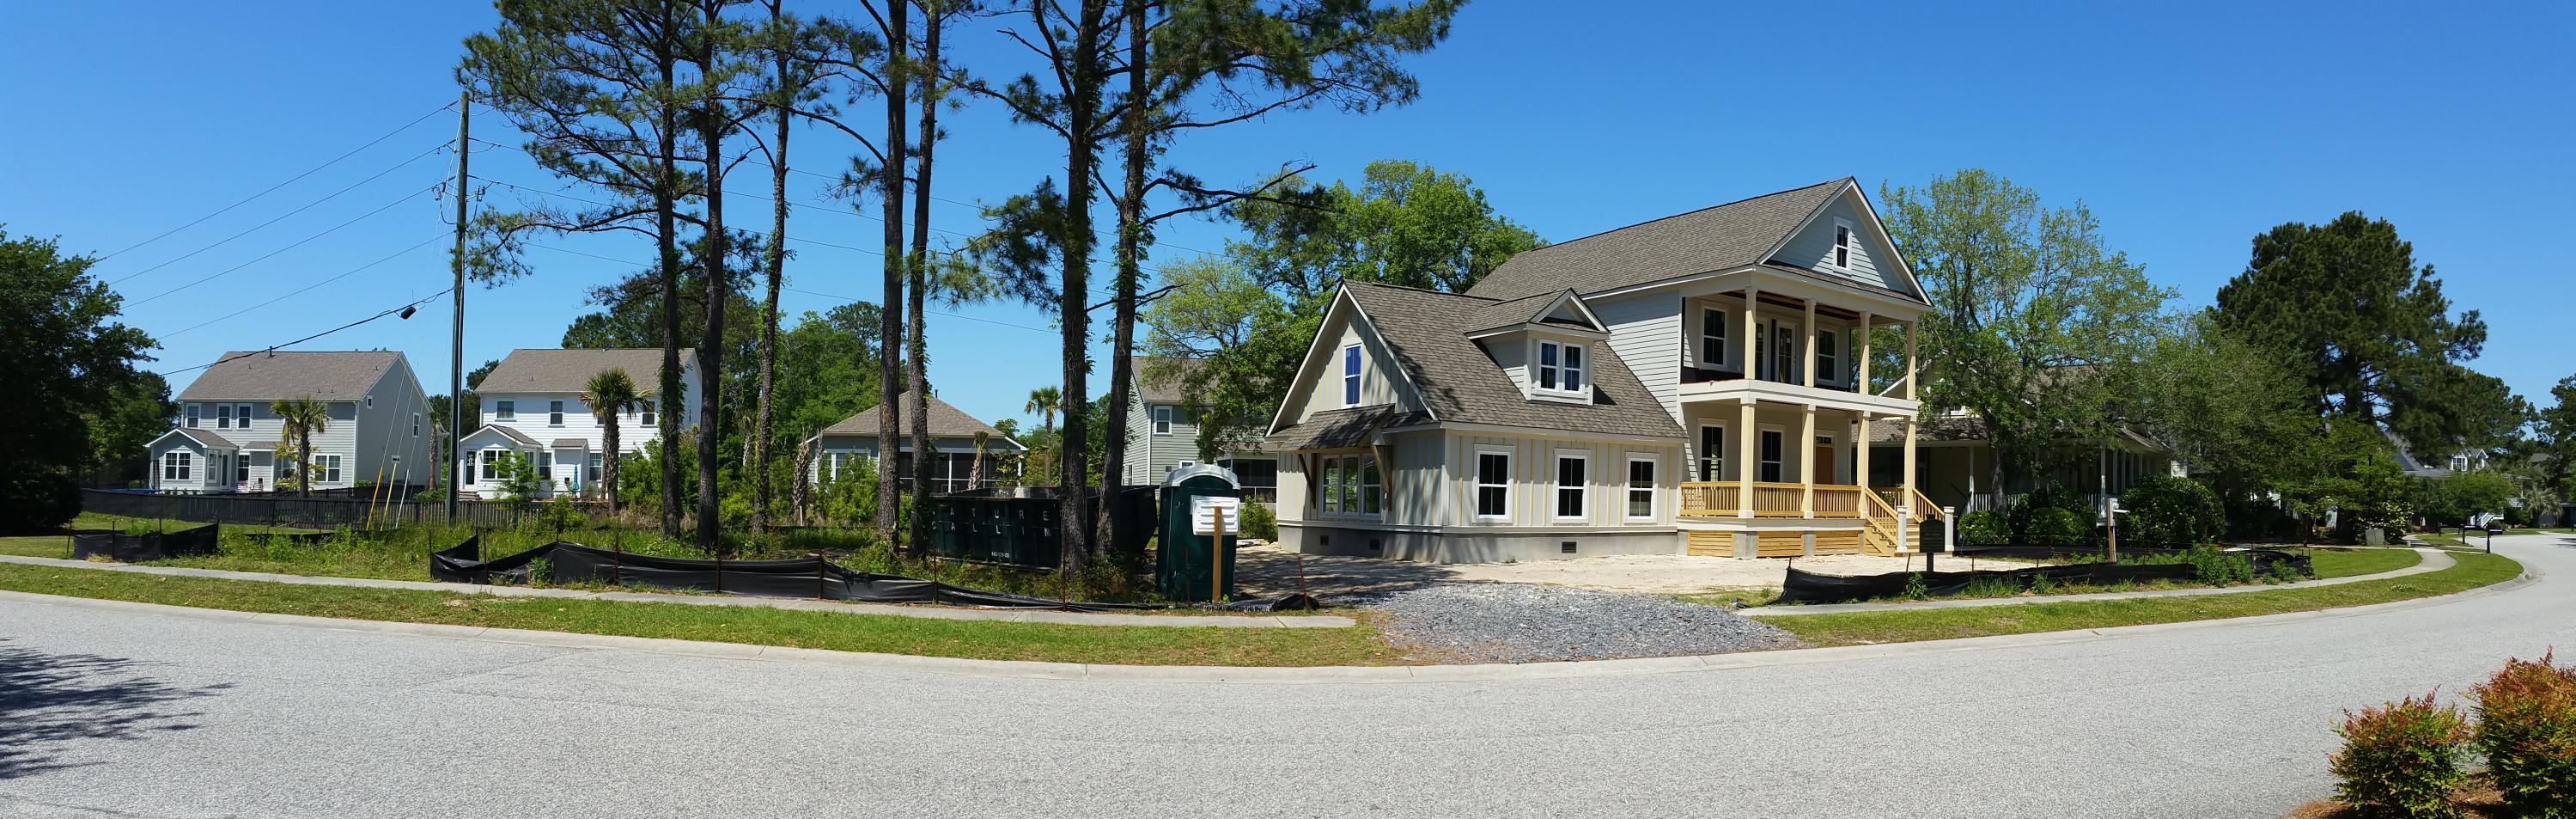 Grassy Creek Homes For Sale - 385 Shoals, Mount Pleasant, SC - 14